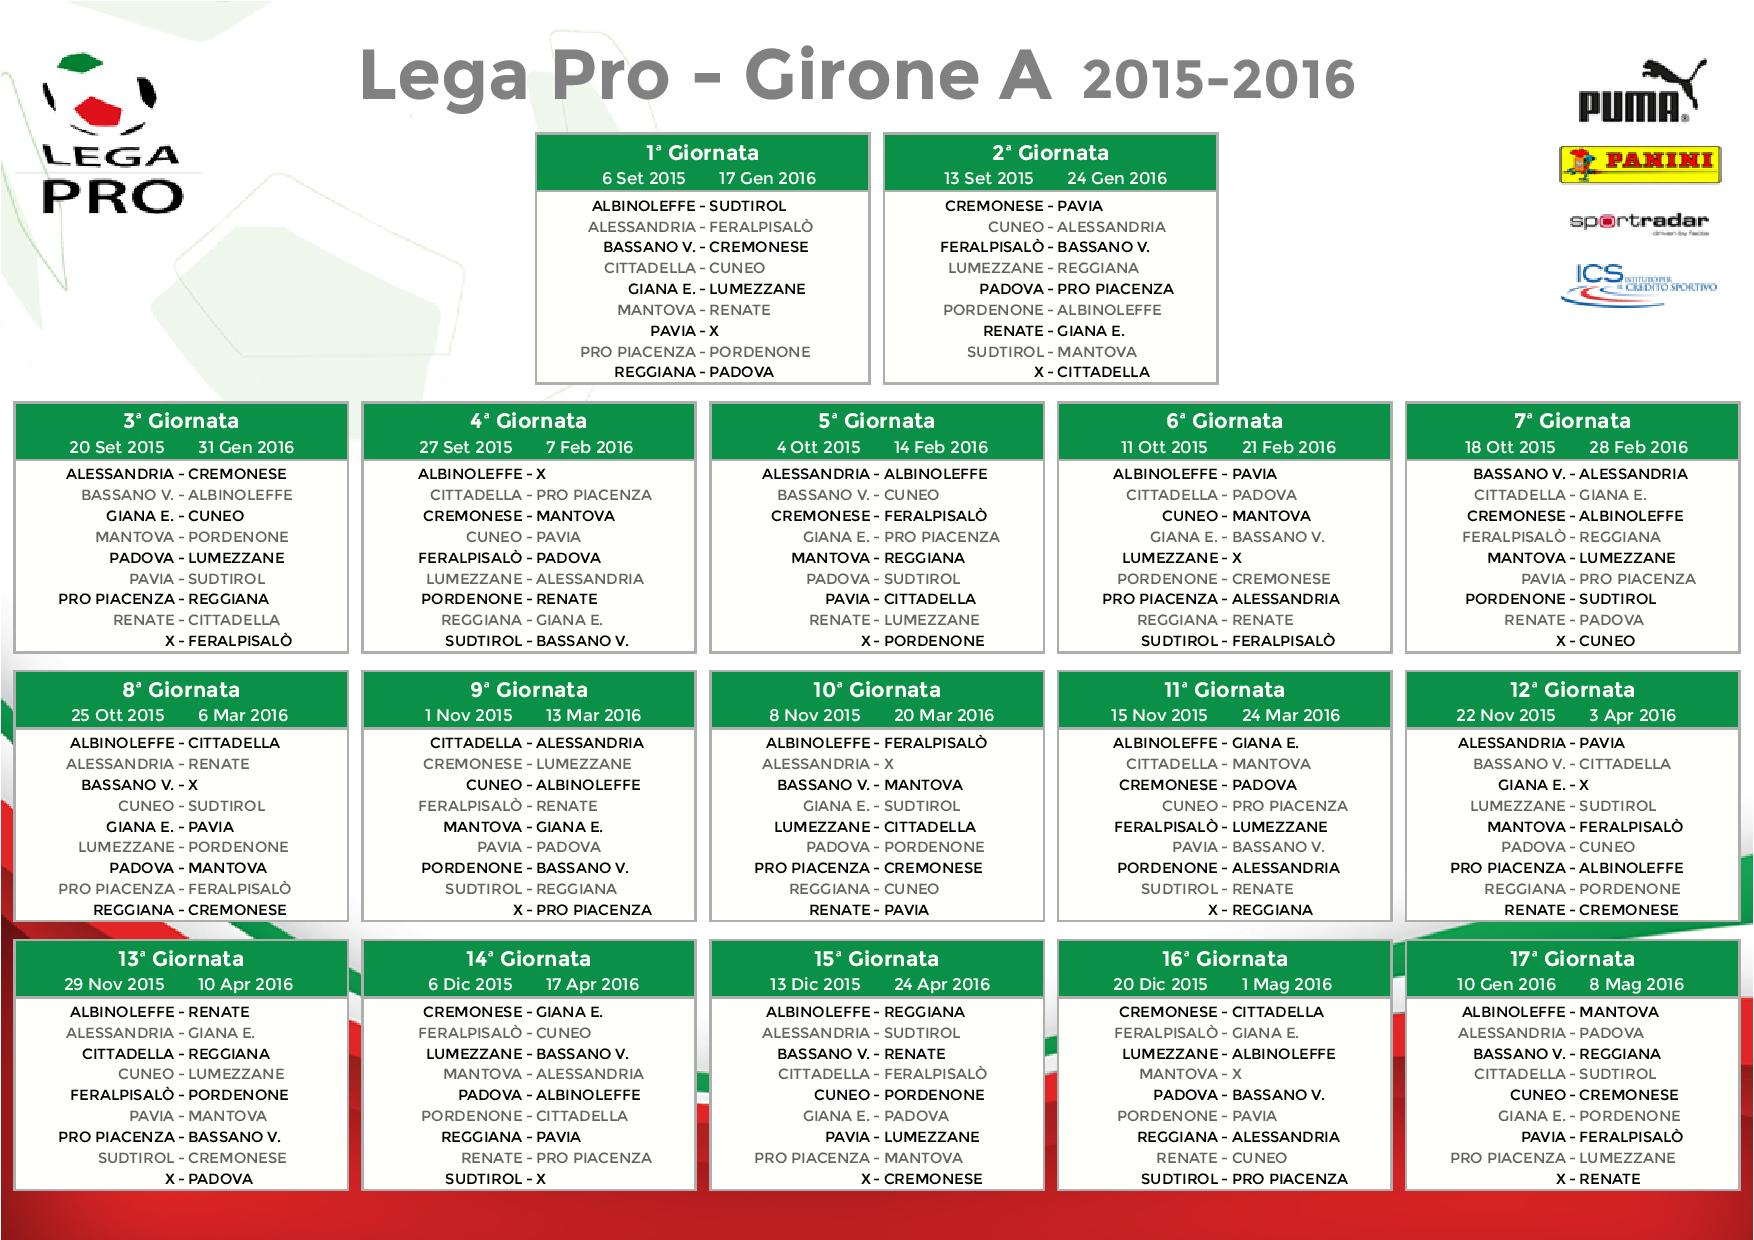 Calendario Calcio Padova.Pavia Calcio Calendario Partite Legapro Girone A 2015 2016